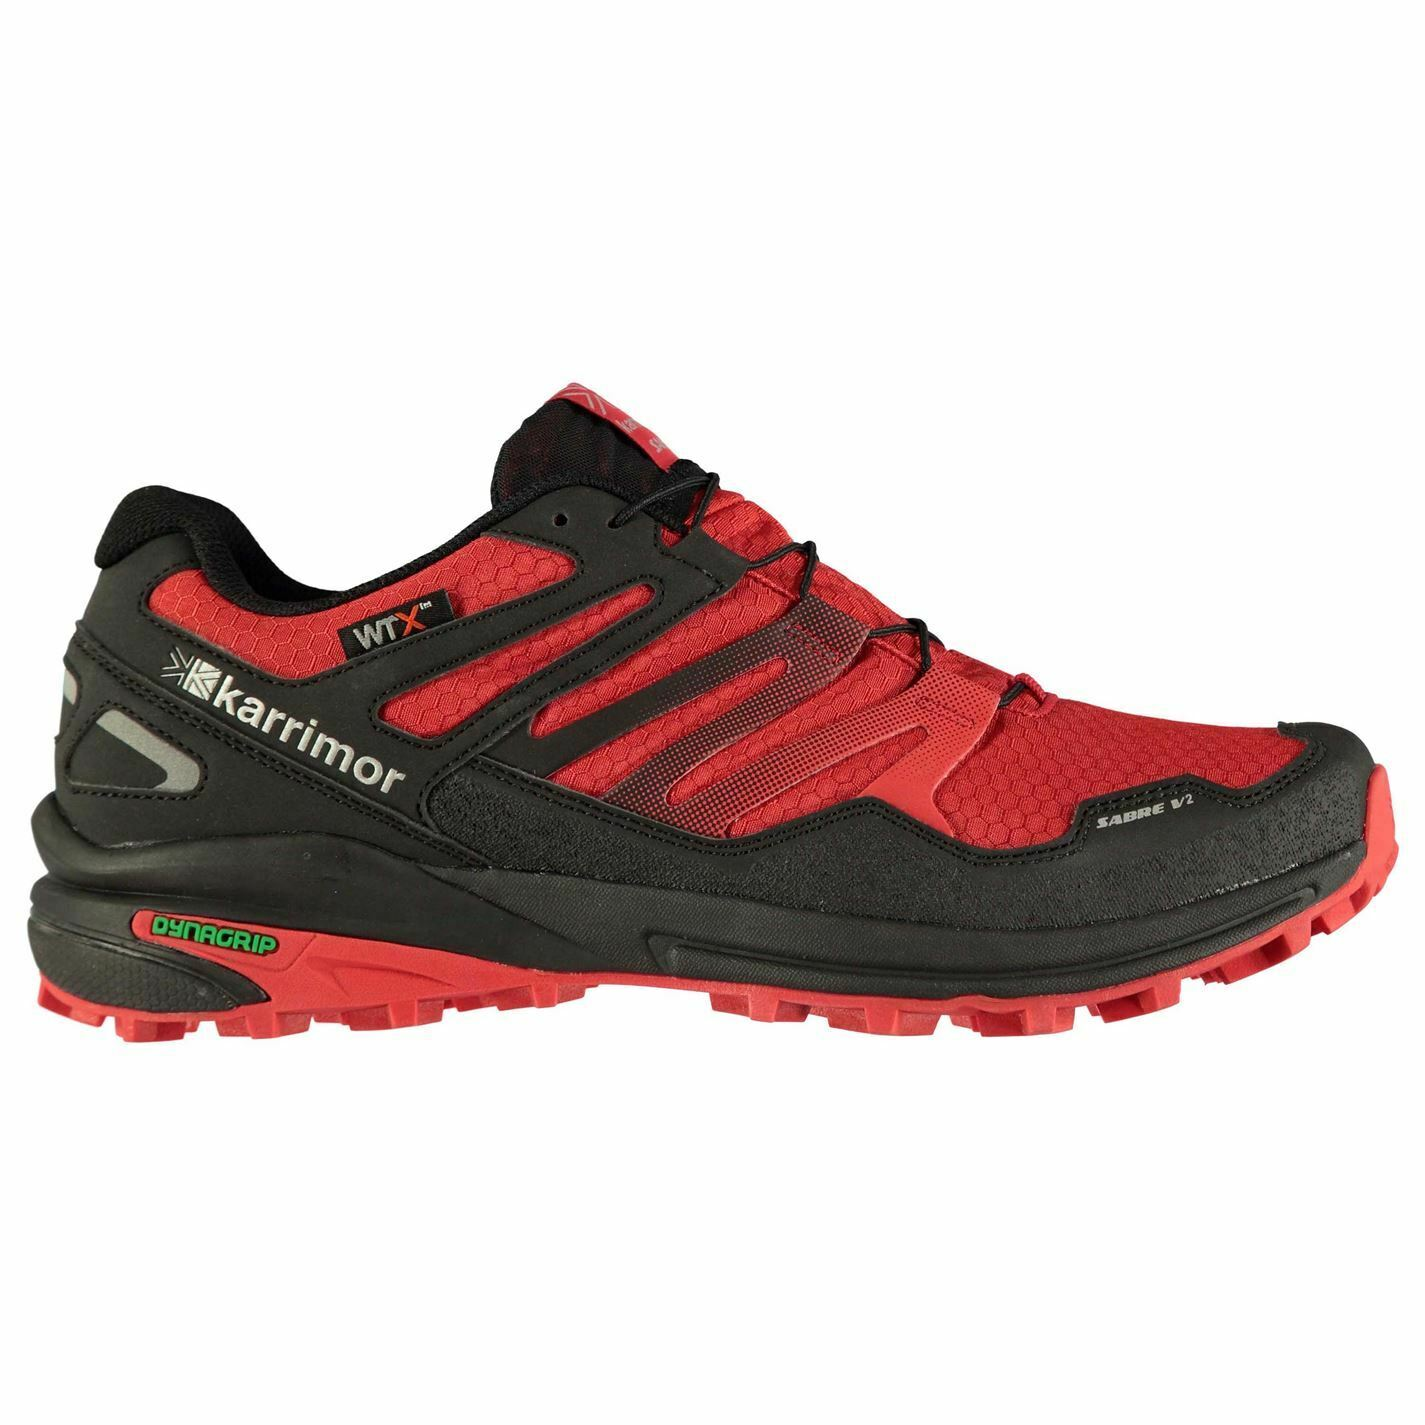 Karrimor  Sabre 2 Wtx Trail Corriendo Zapatos para hombre  ventas calientes